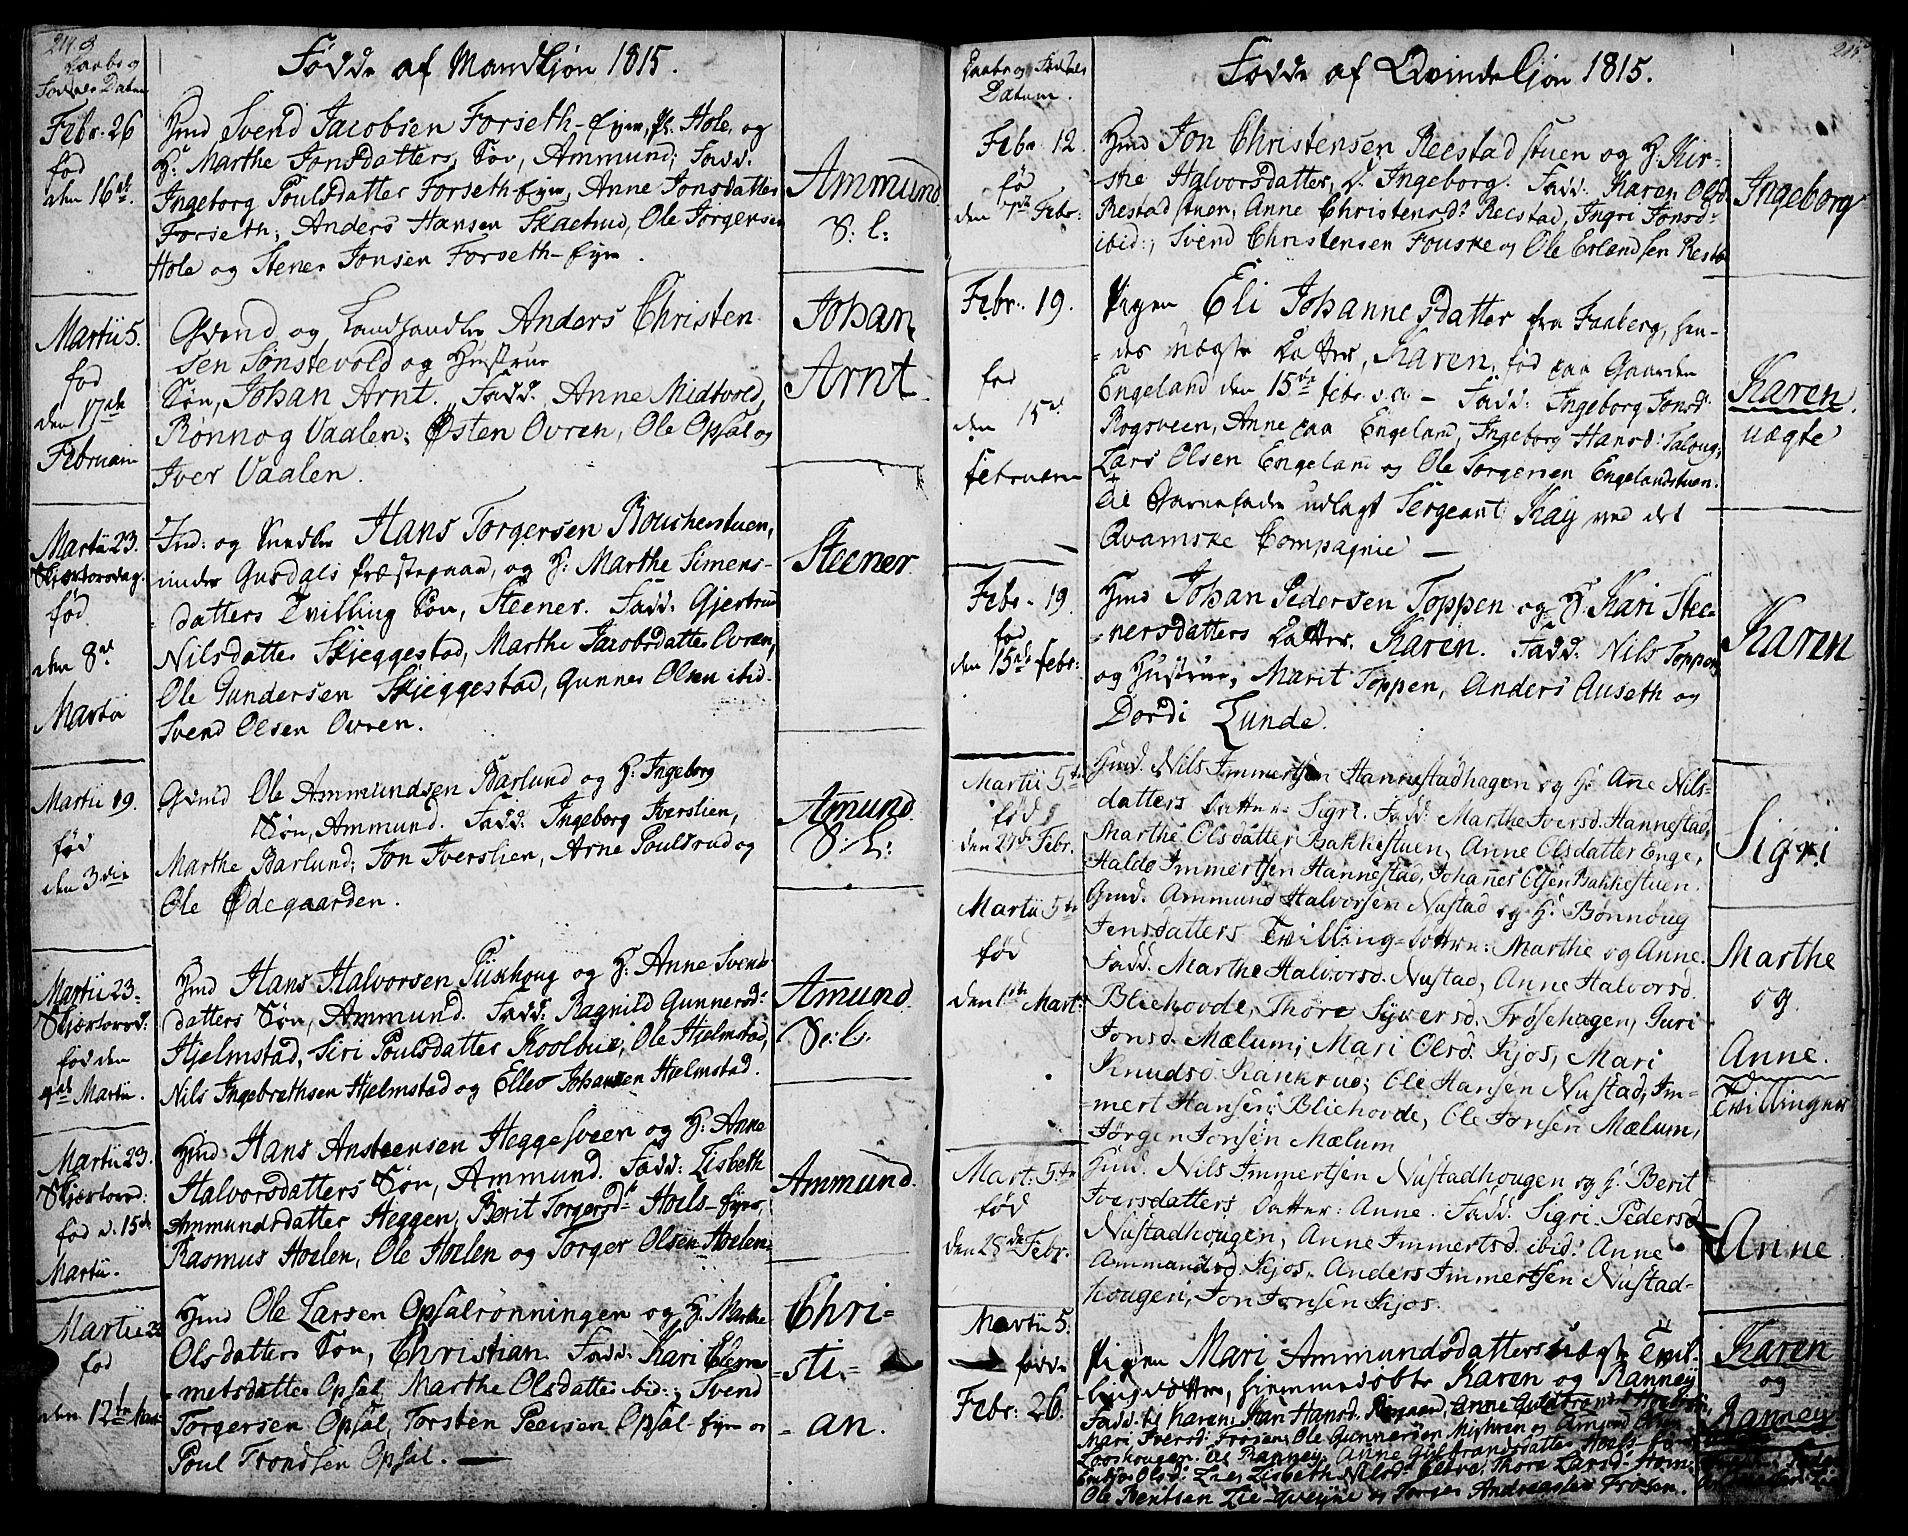 SAH, Gausdal prestekontor, Ministerialbok nr. 4, 1809-1817, s. 214-215